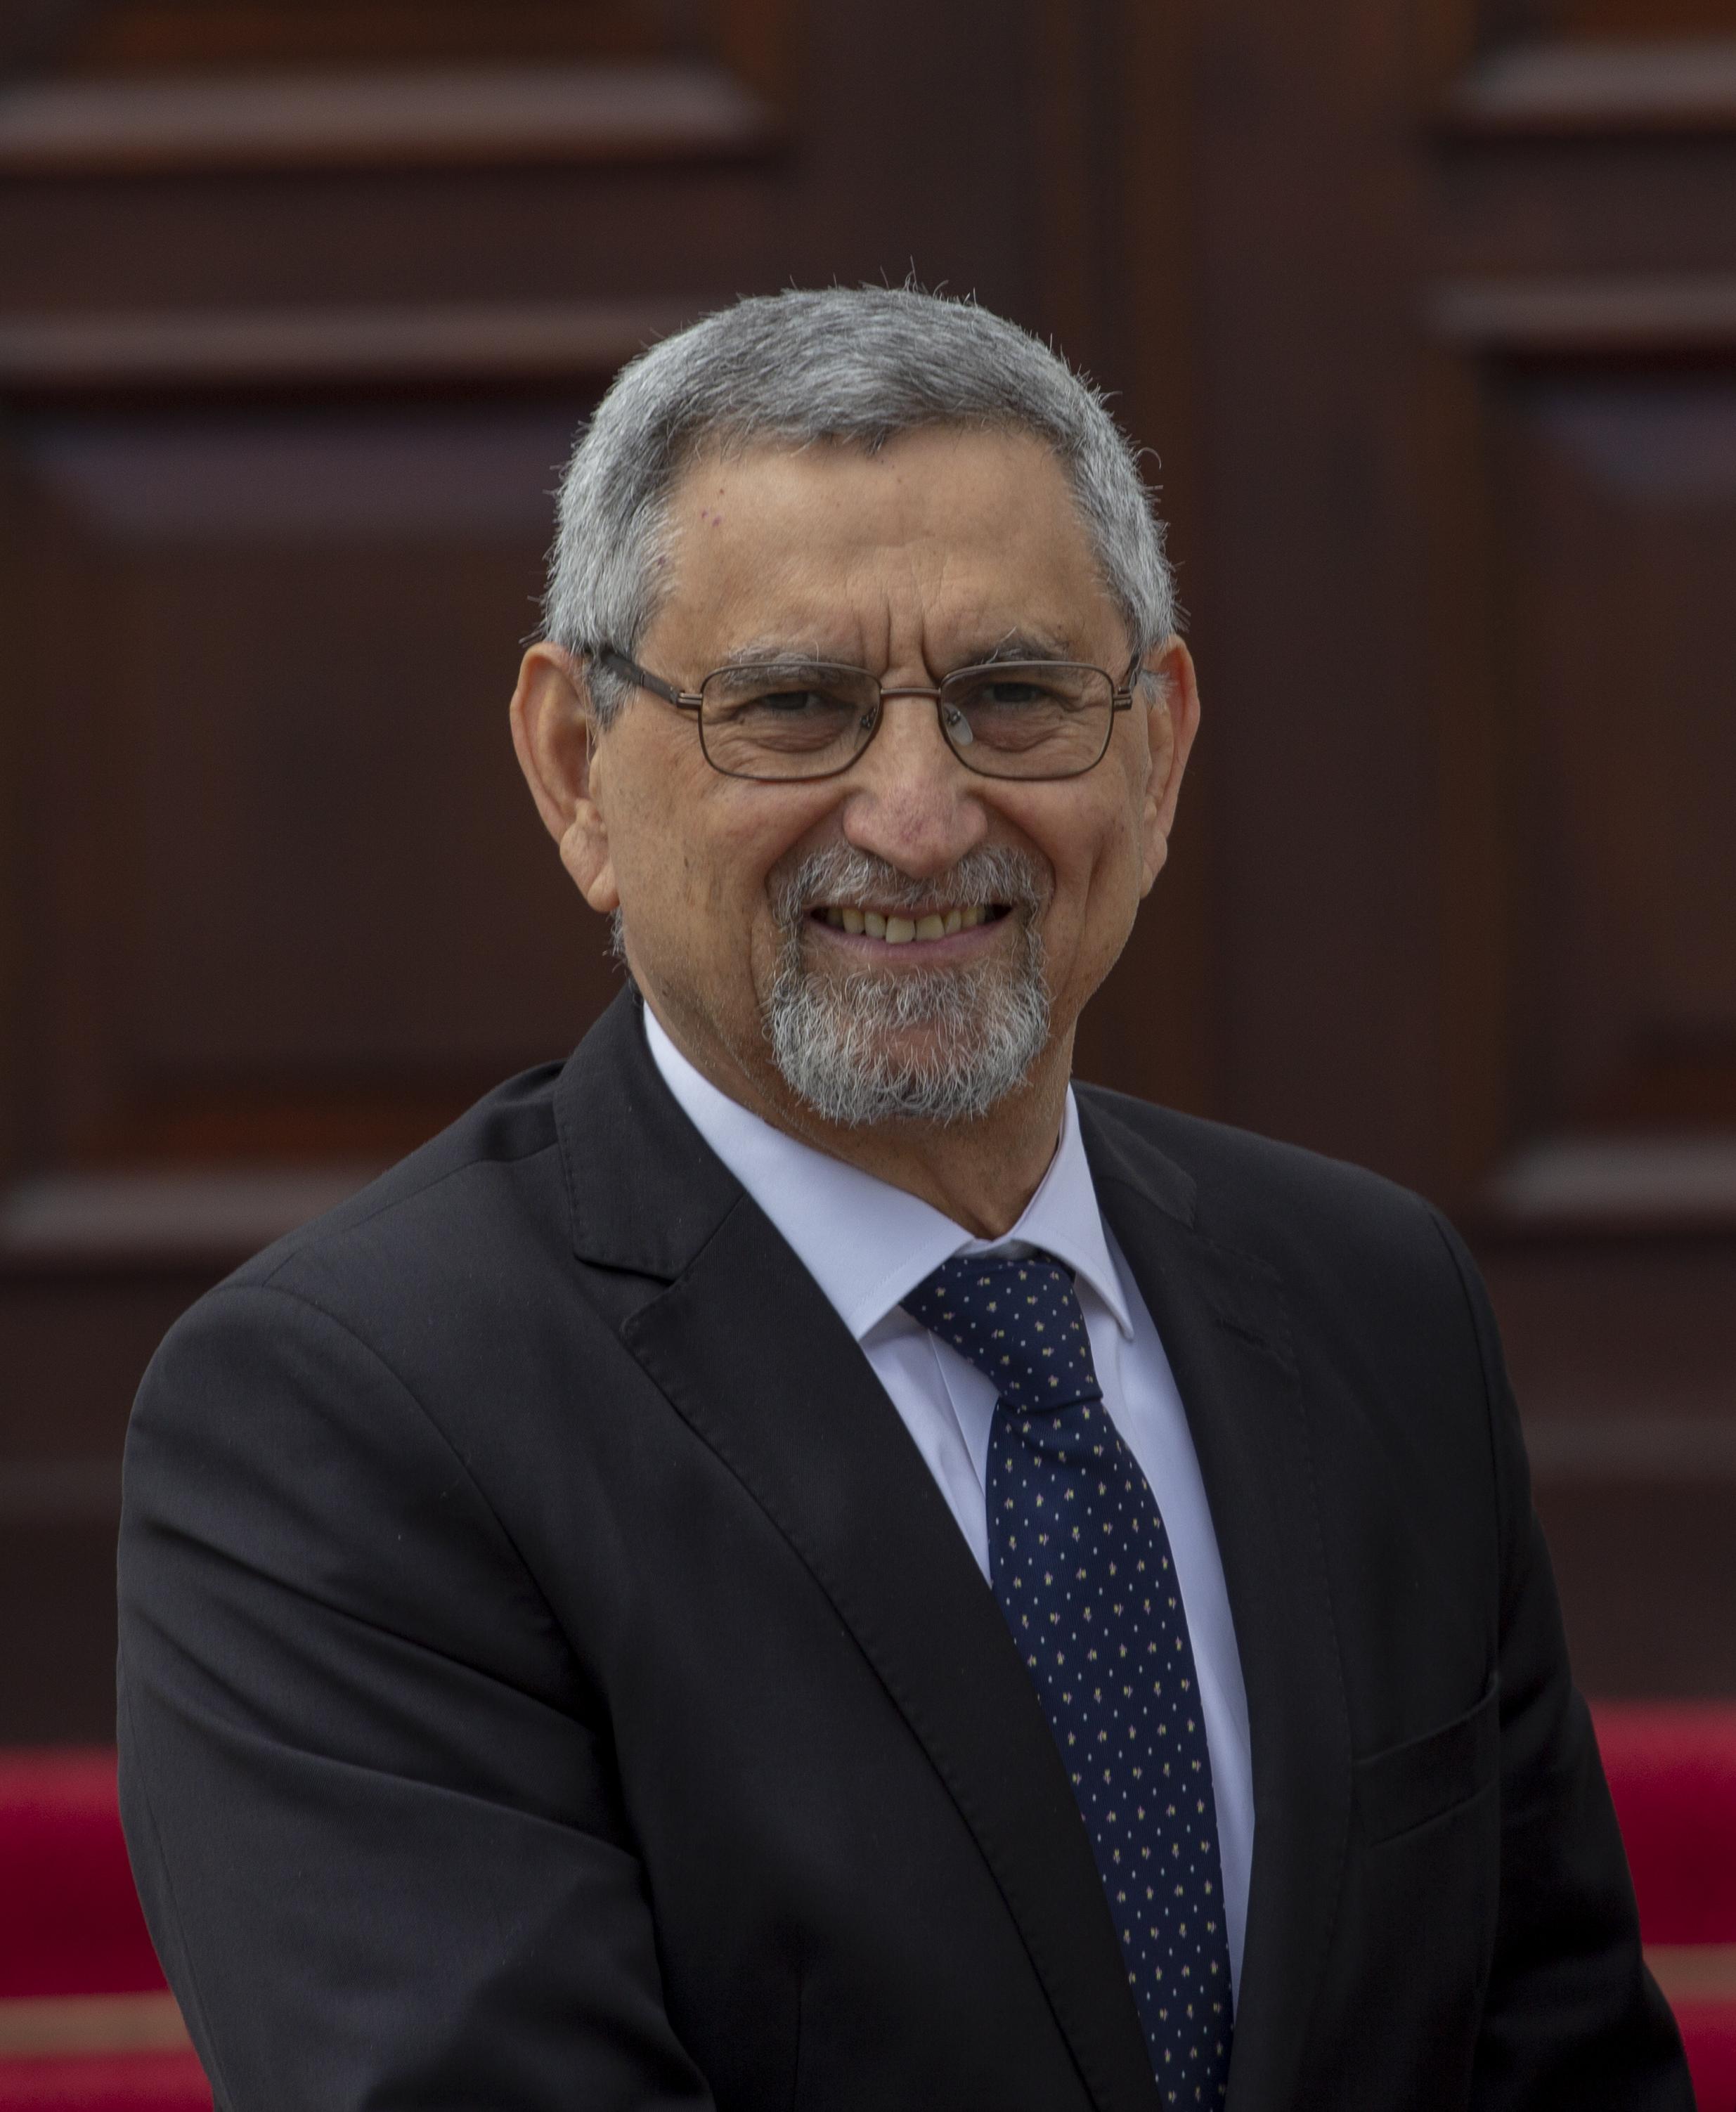 Fonseca in 2019